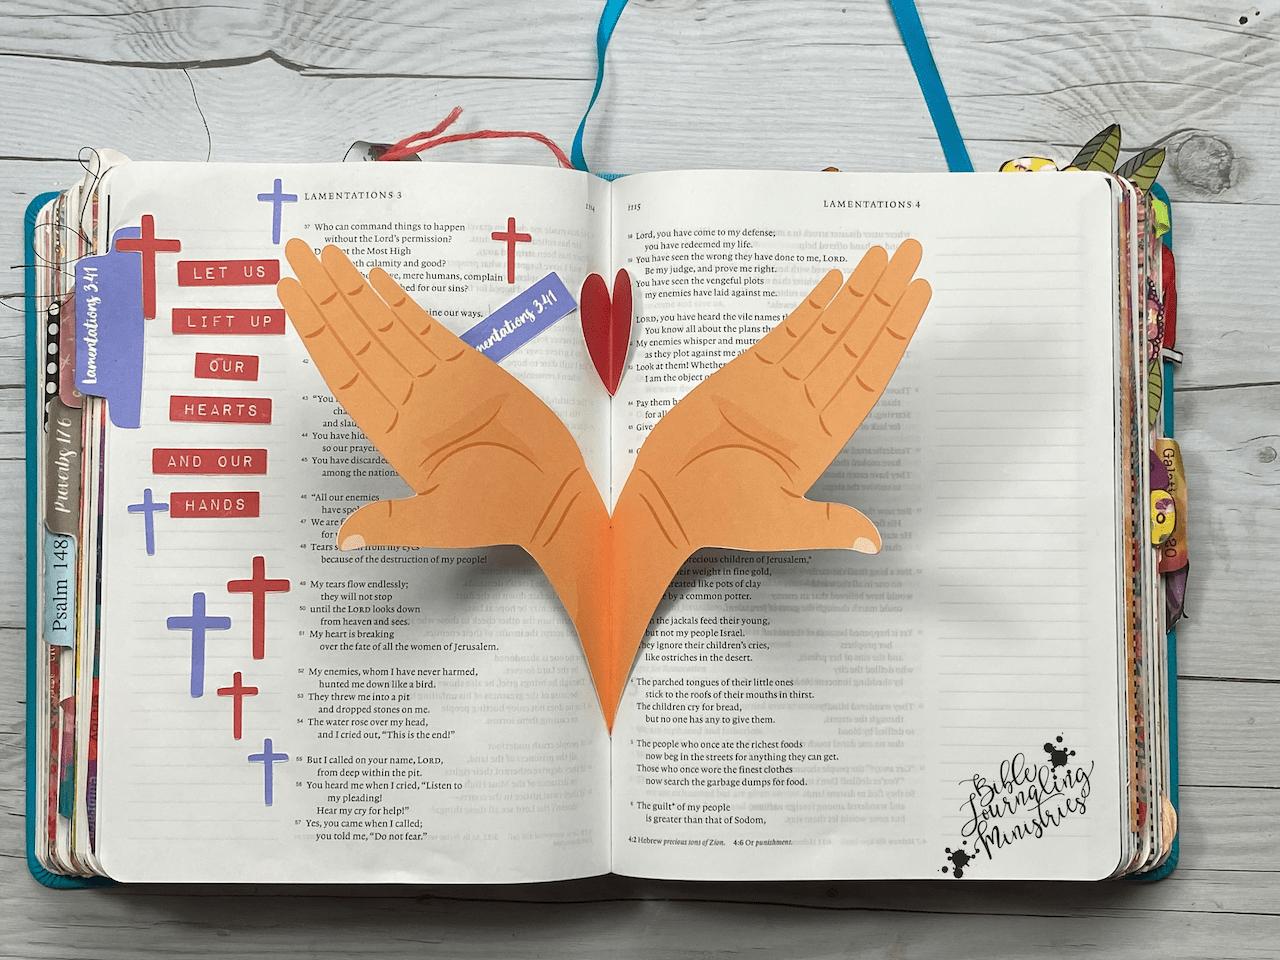 Lamentations 3:41